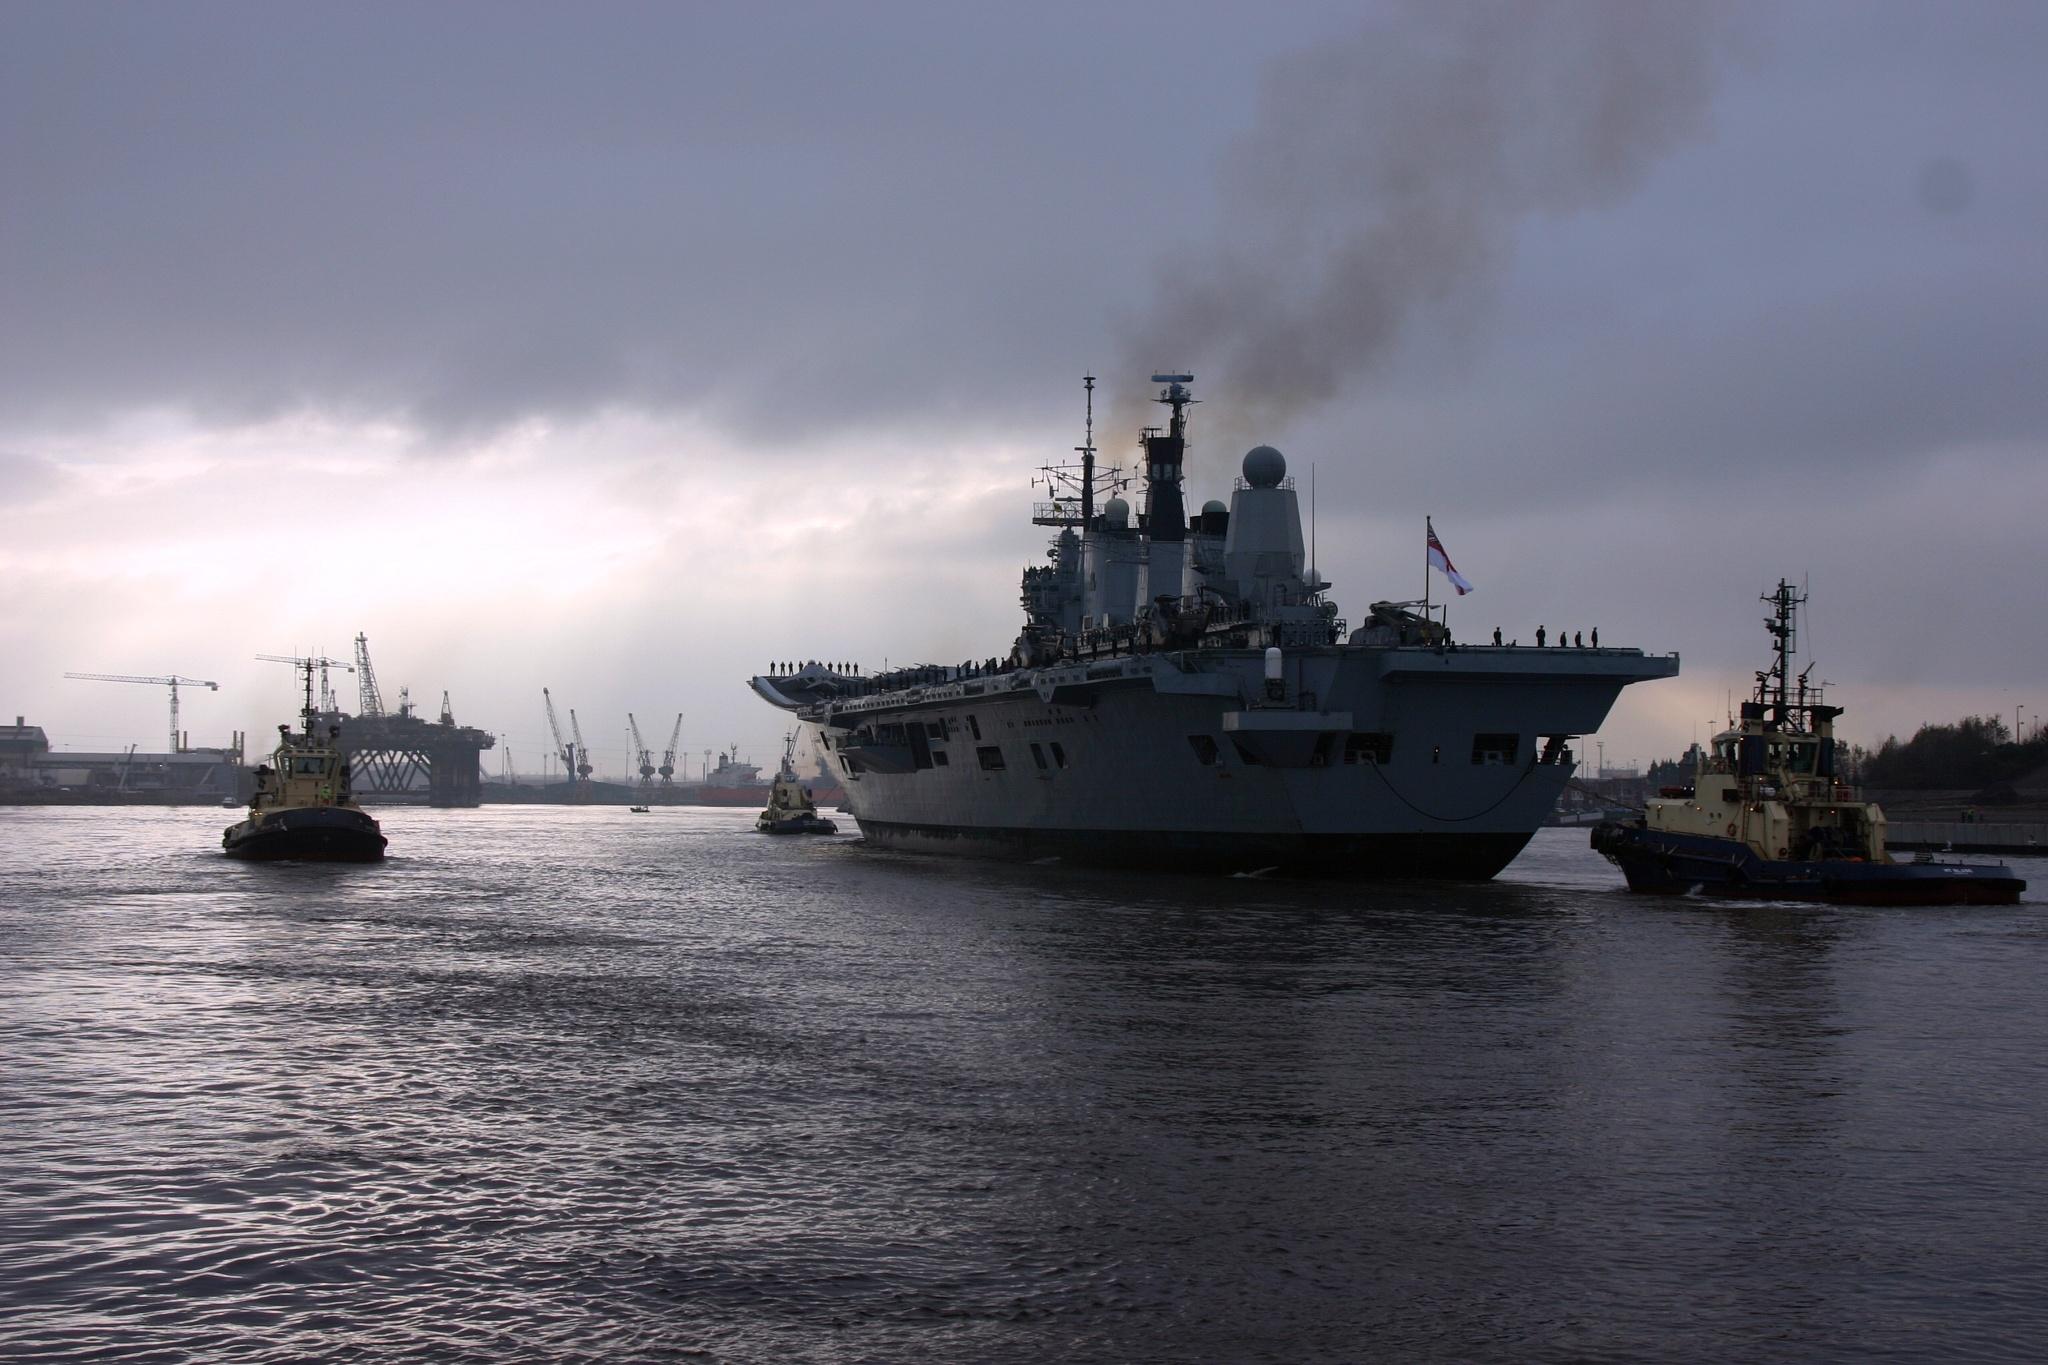 HMS Ark Royal by bunts45